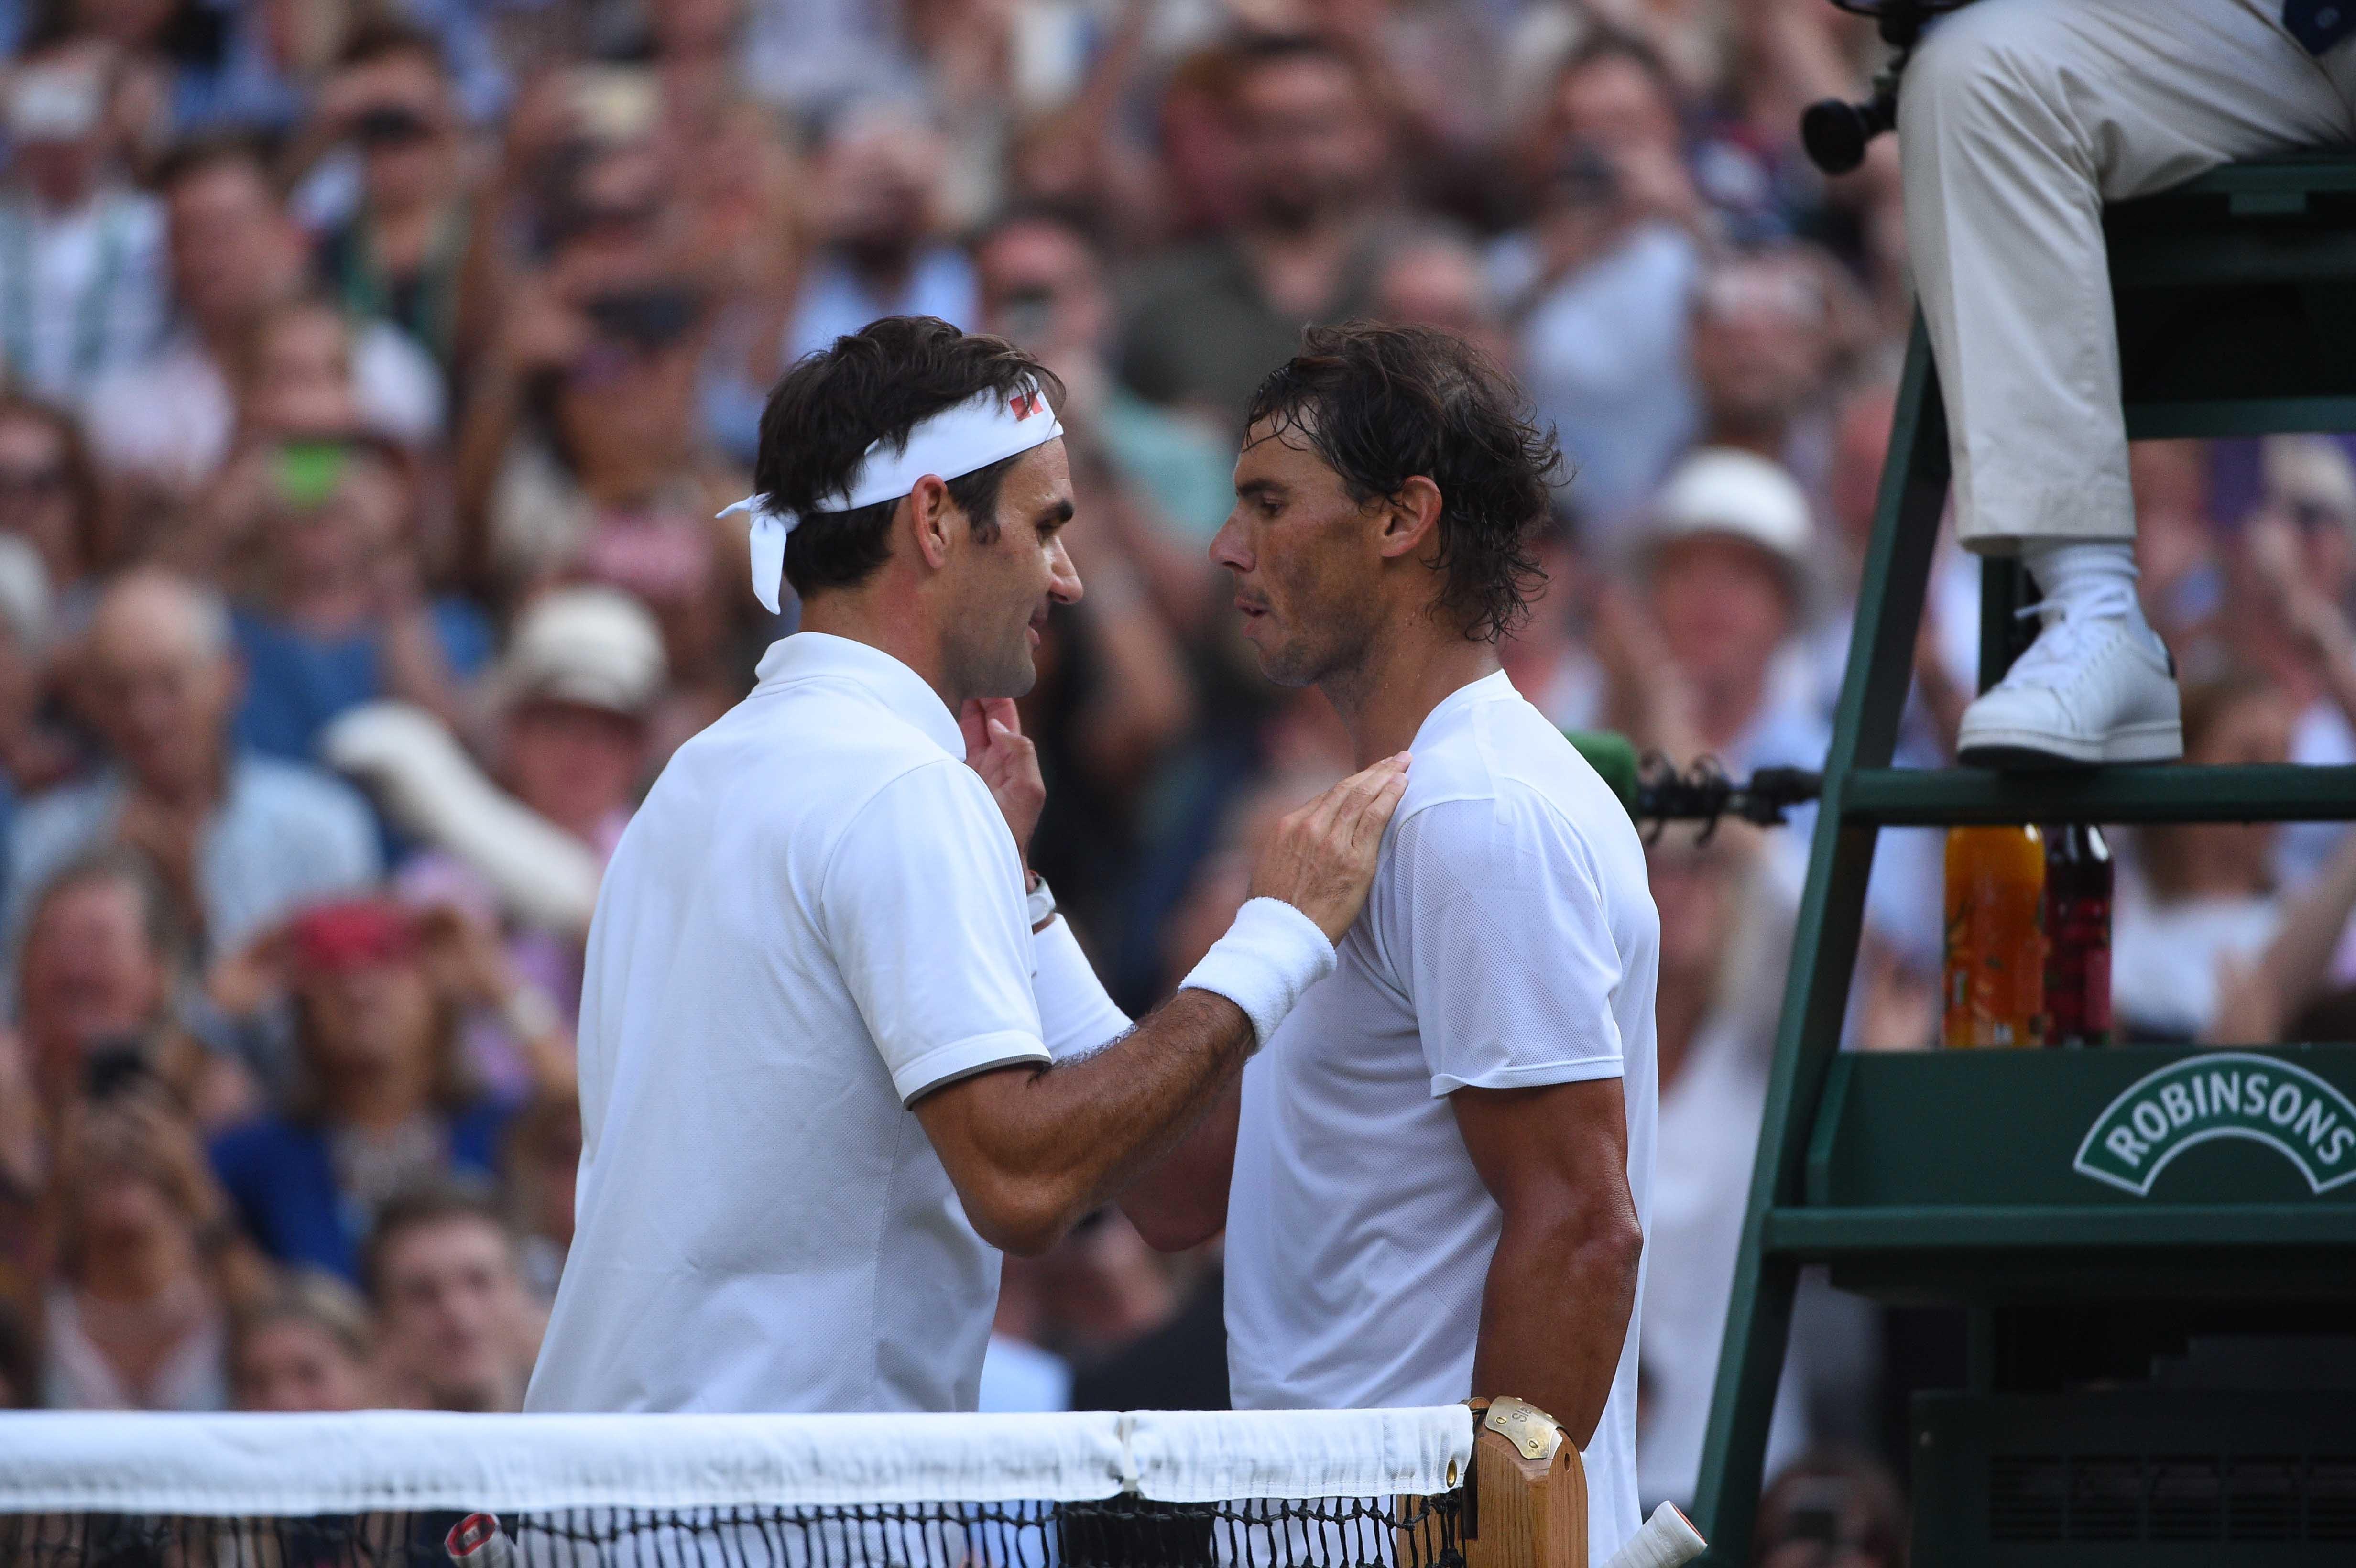 Rafael Nadal congratulates Roger Federer at the net after the Swiss won their semi final match-up at Wimbledon 2019